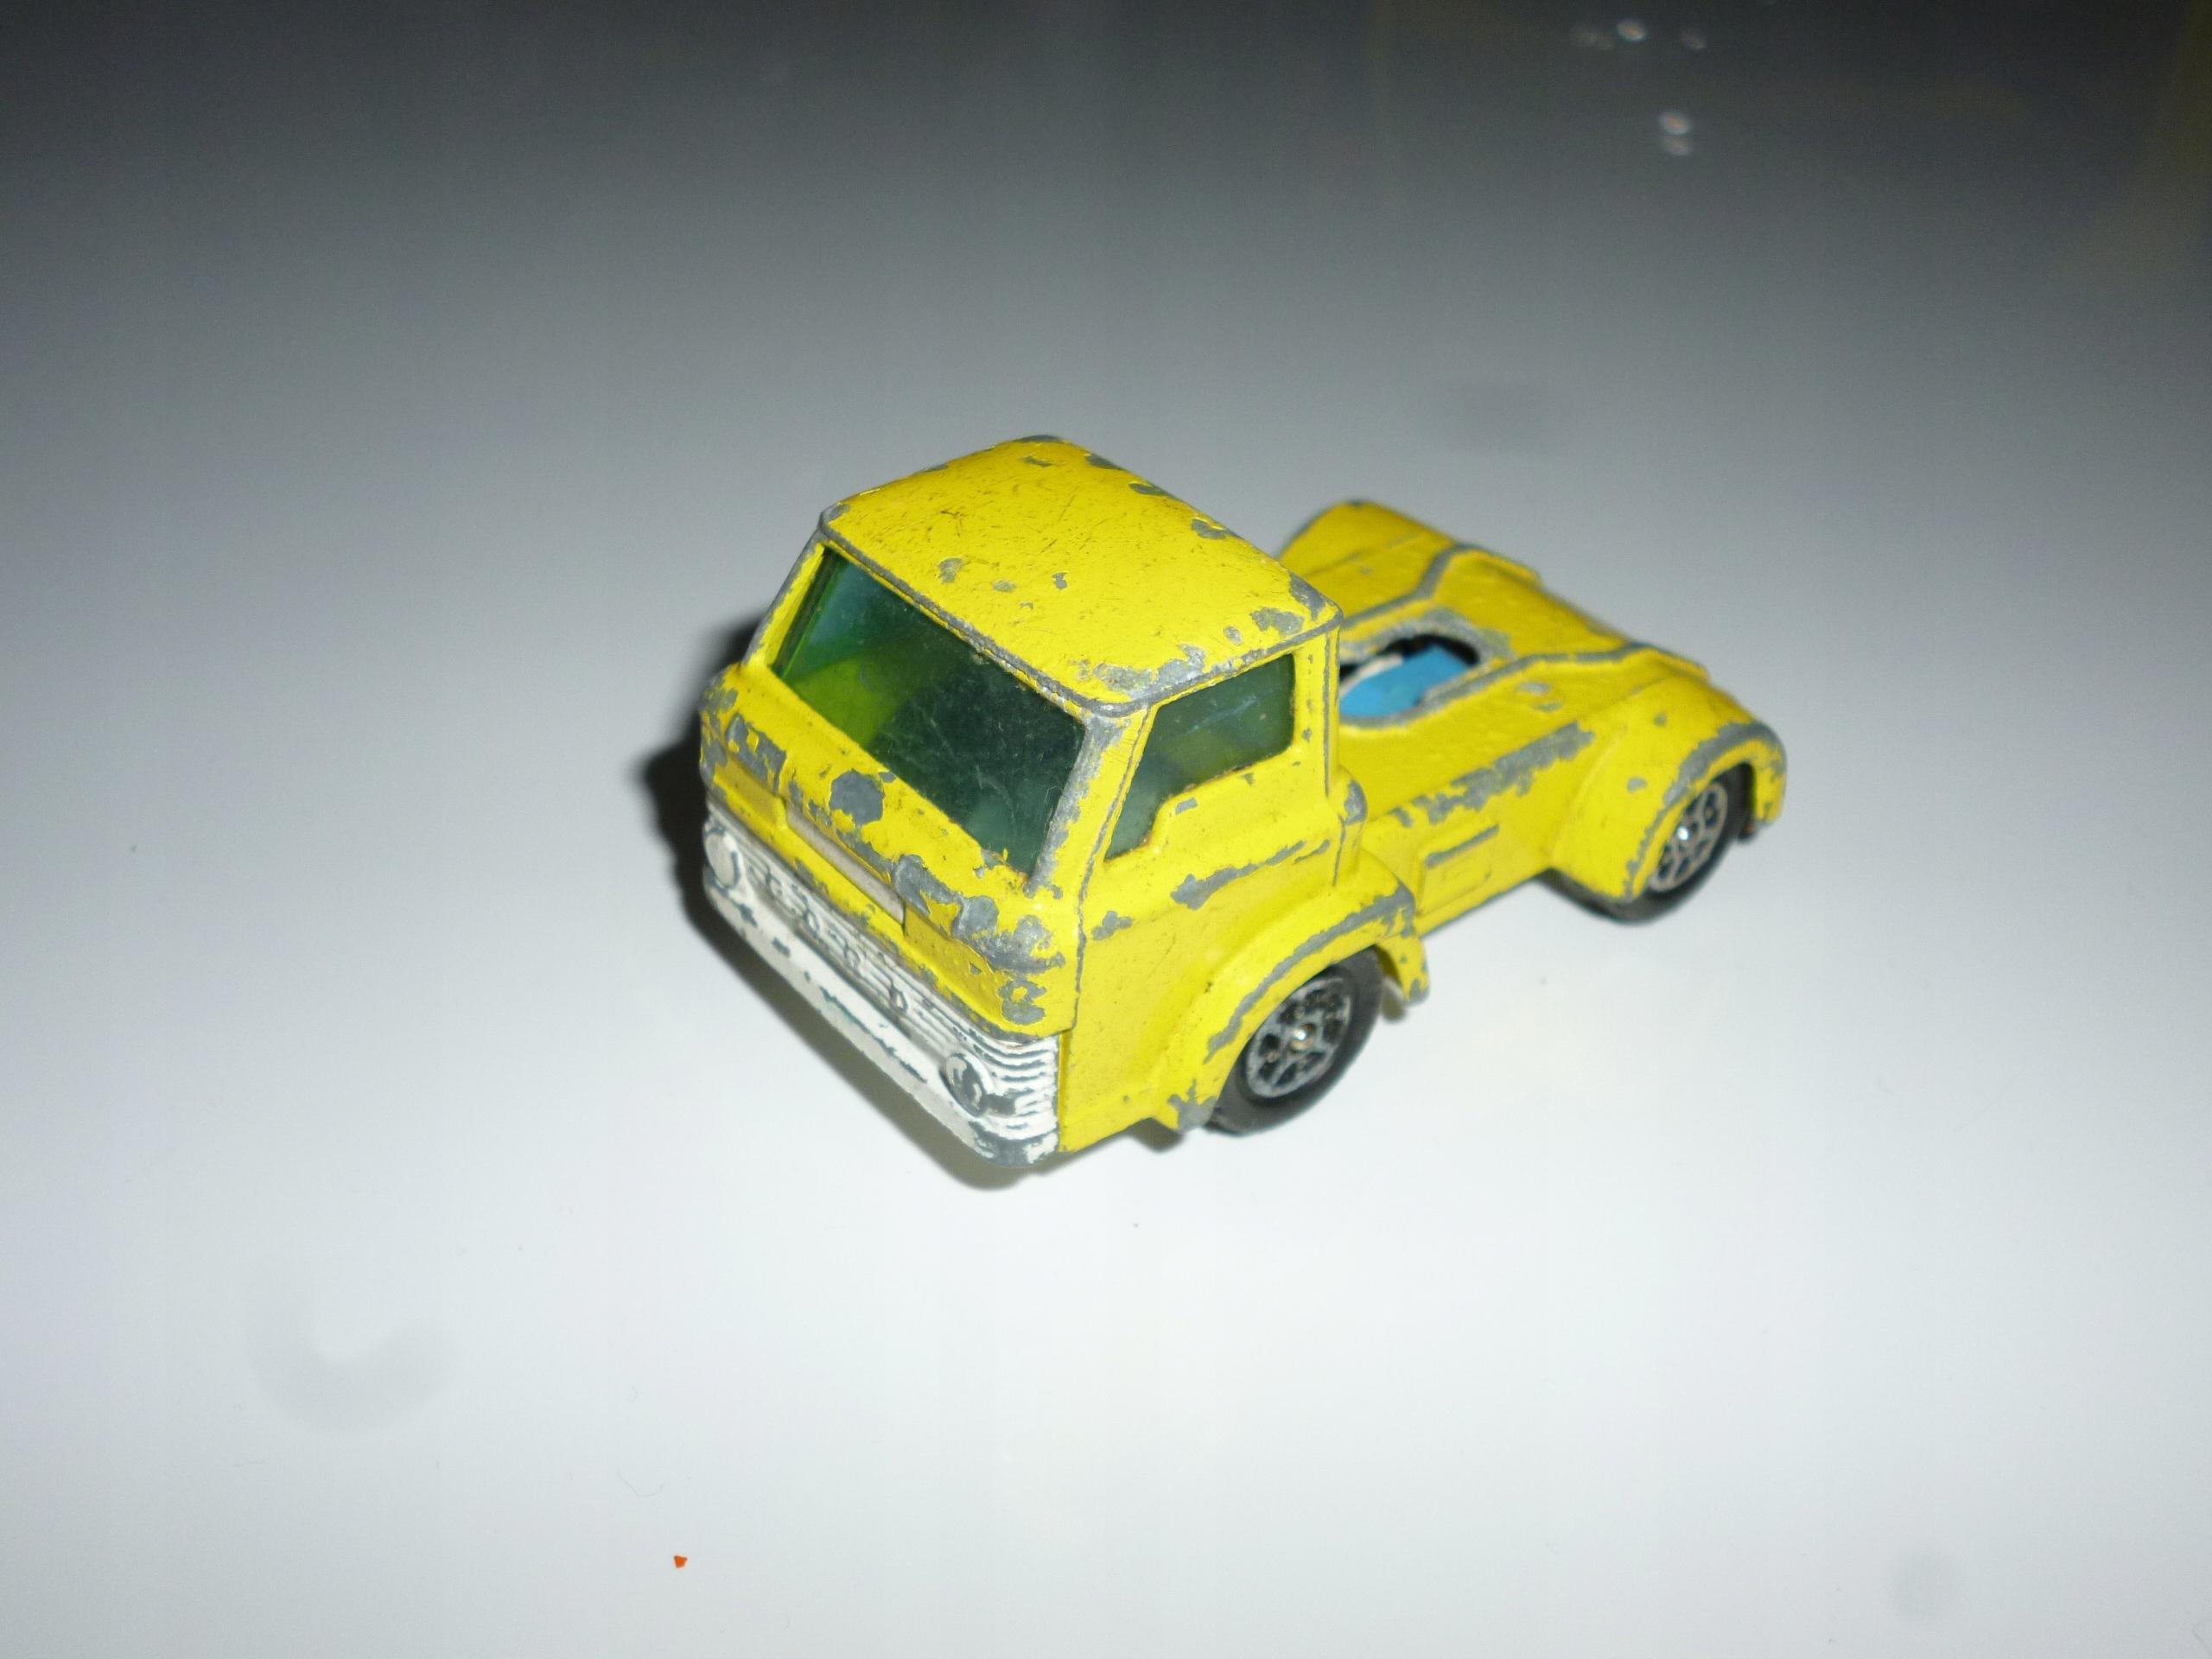 Ford Seria D Corgi model resorak autko